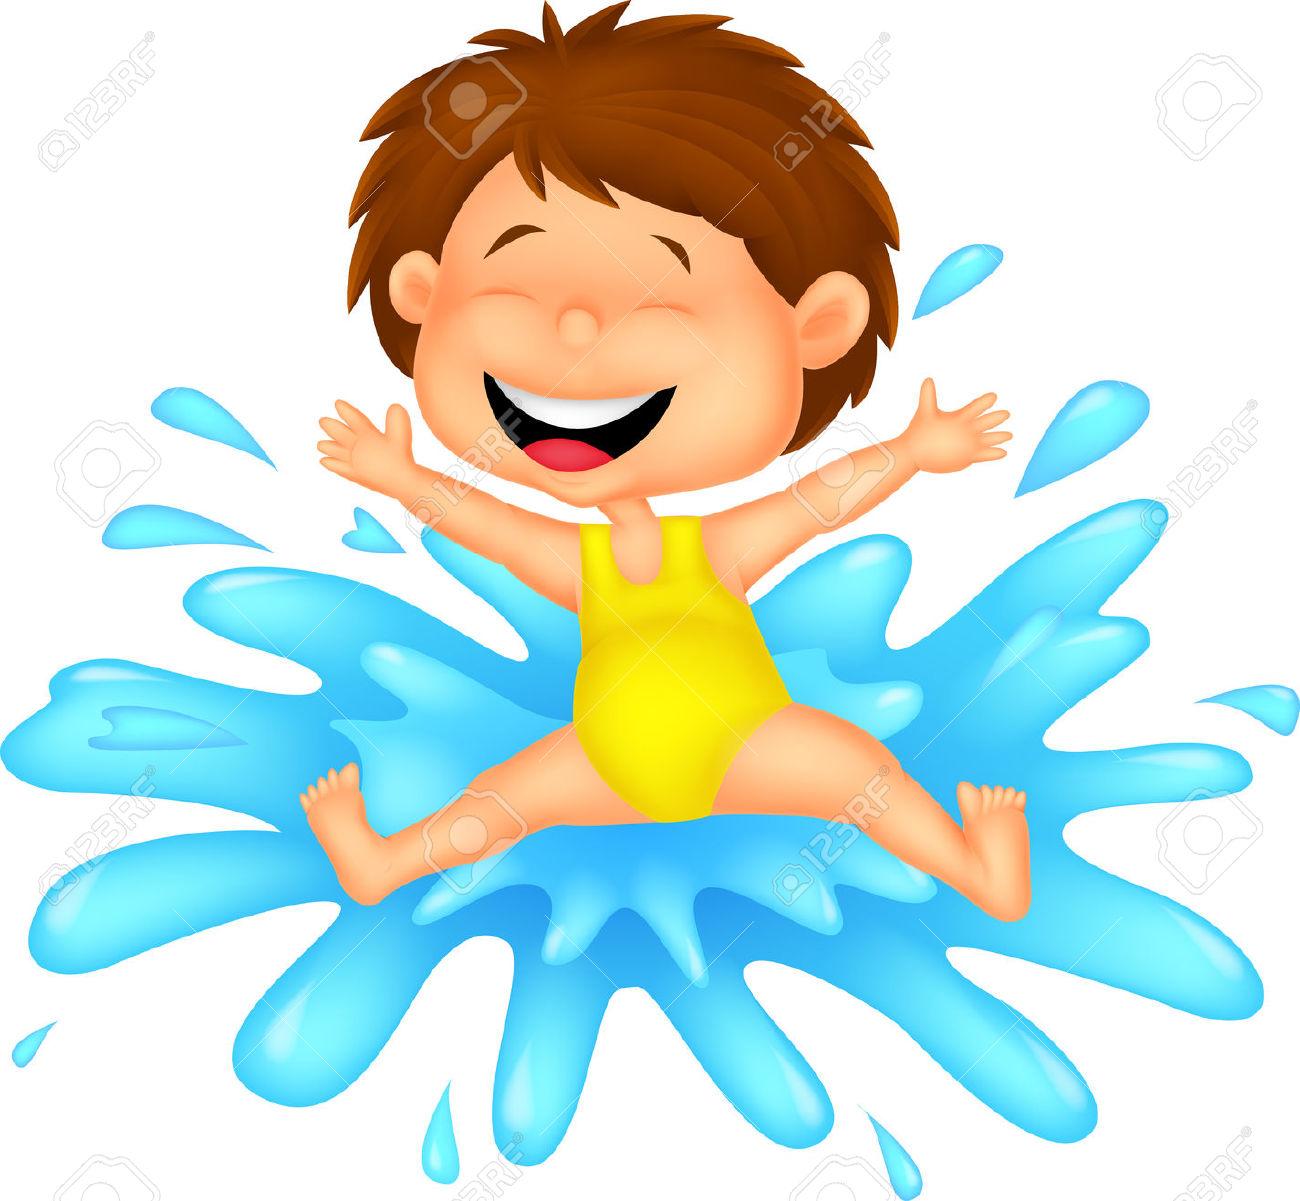 Water splash play. Fun clipart free download